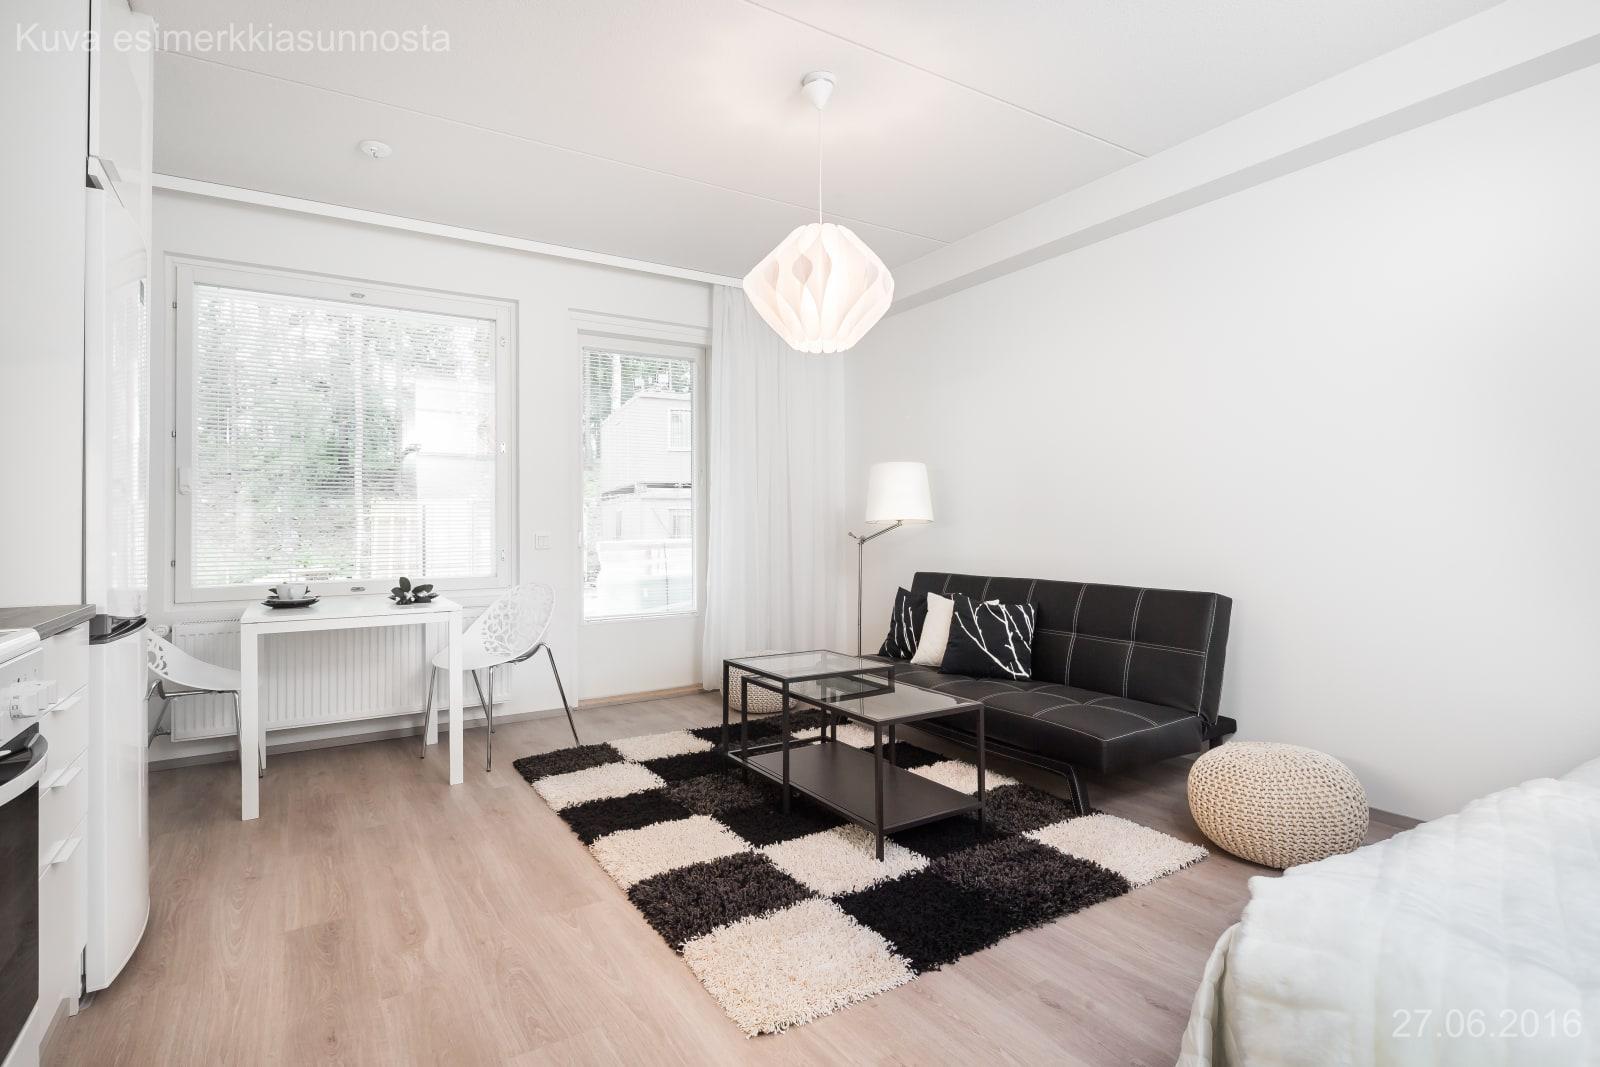 Tampere, Atala, Atanväylä 4A